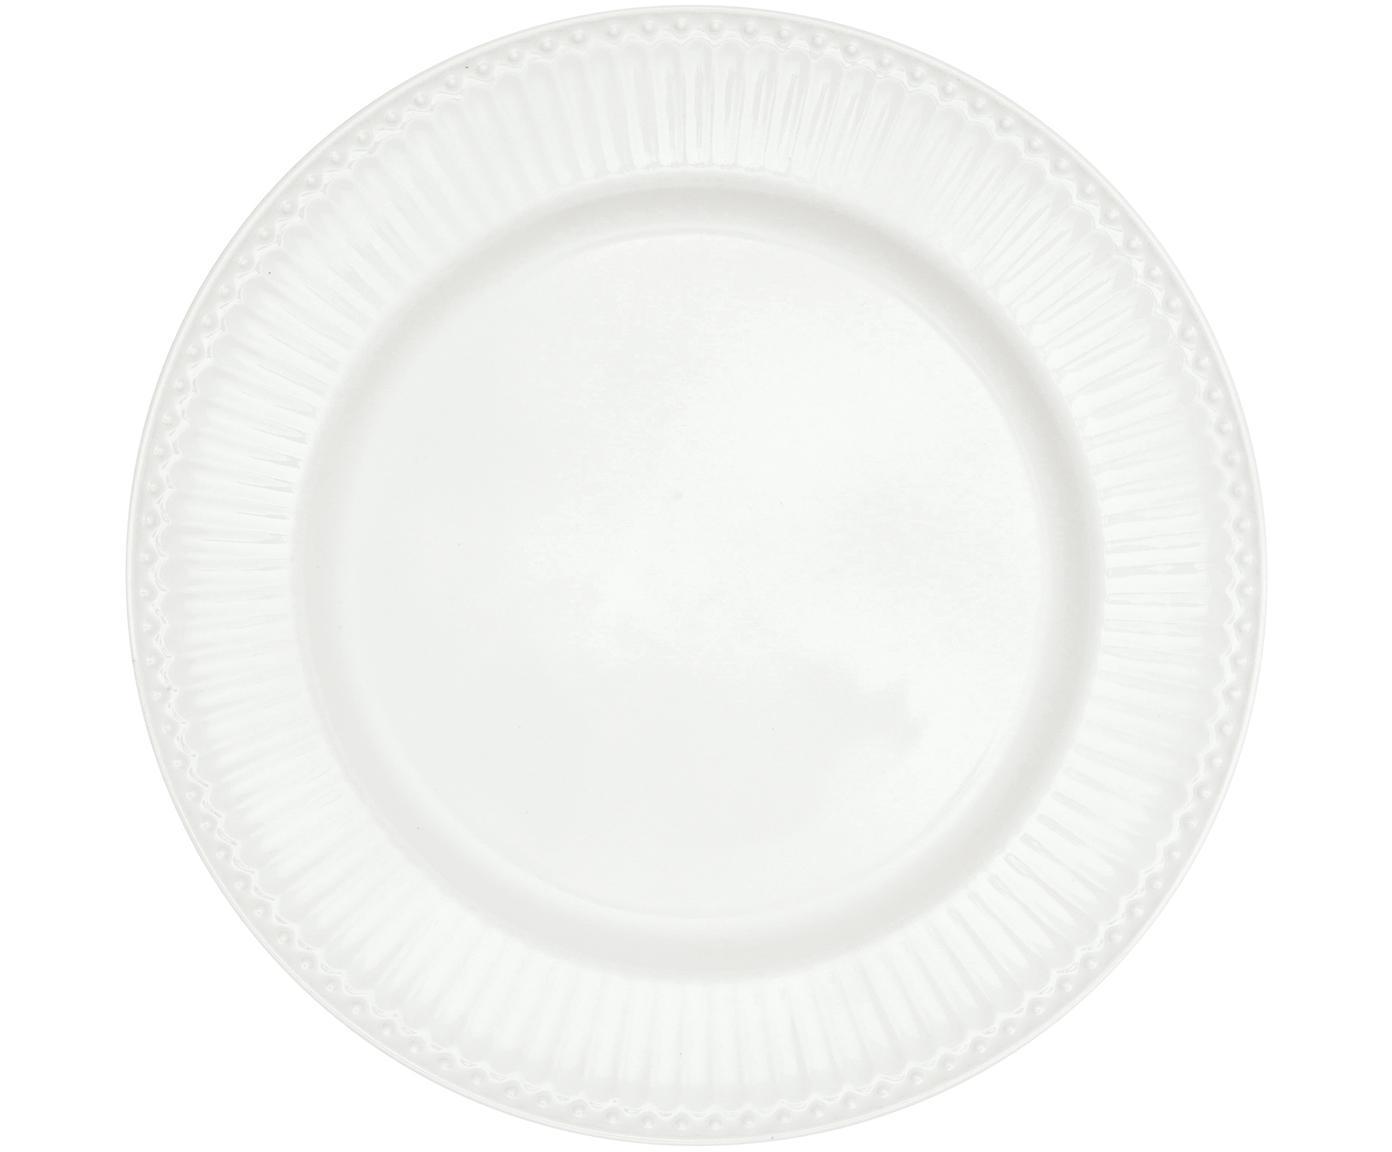 Dinerbord Alice, 2 stuks, Porselein, Wit, Ø 27 cm